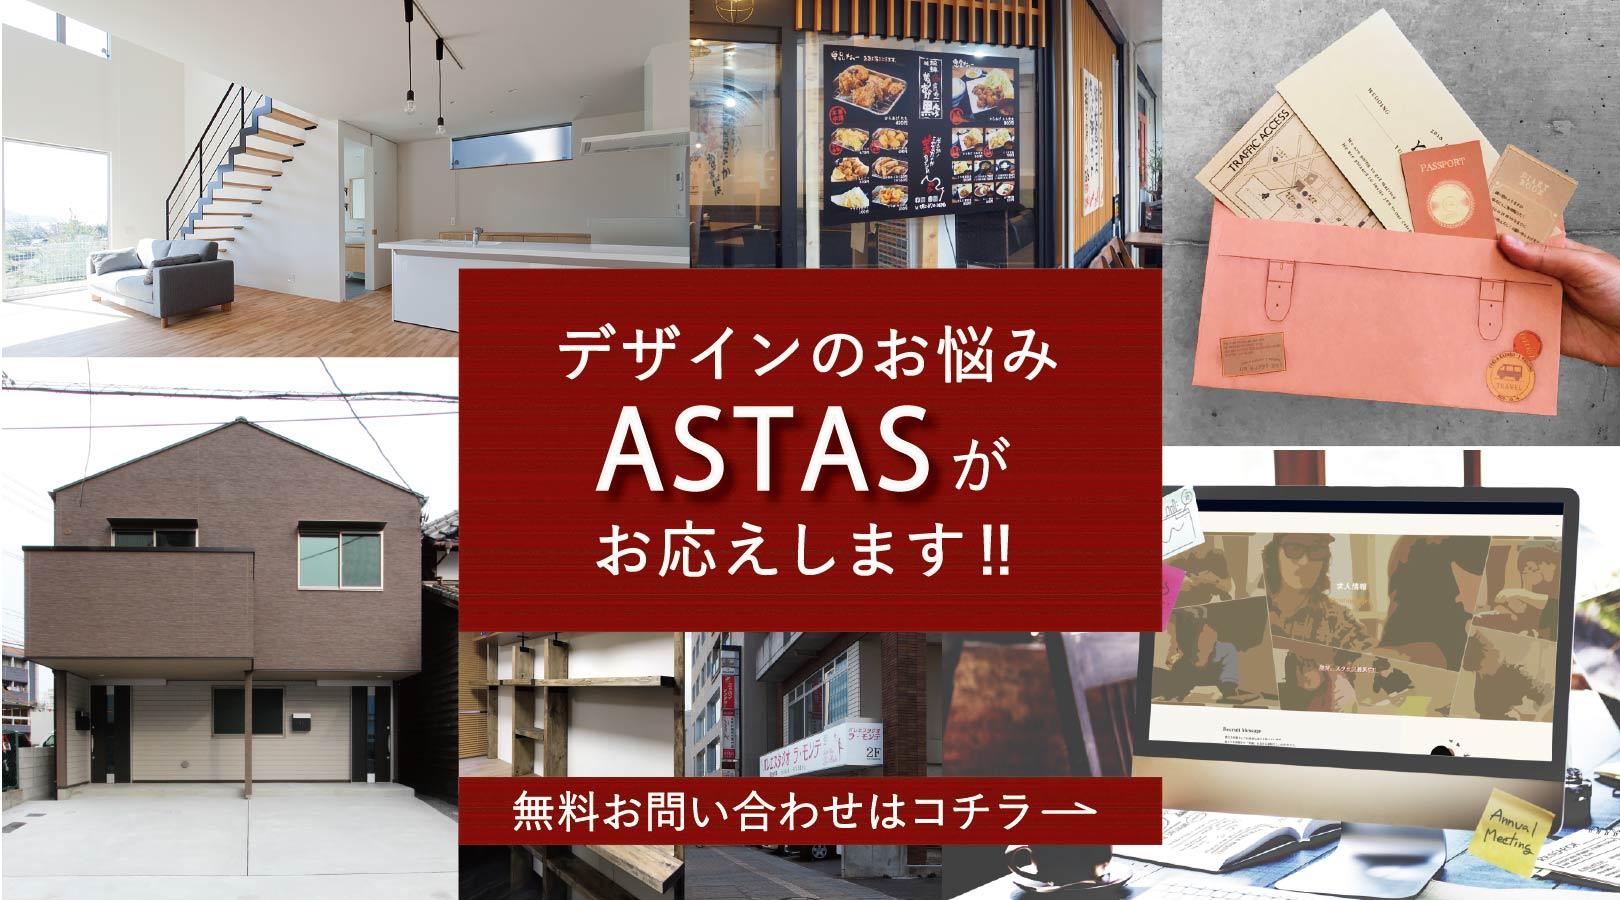 astas-slide01